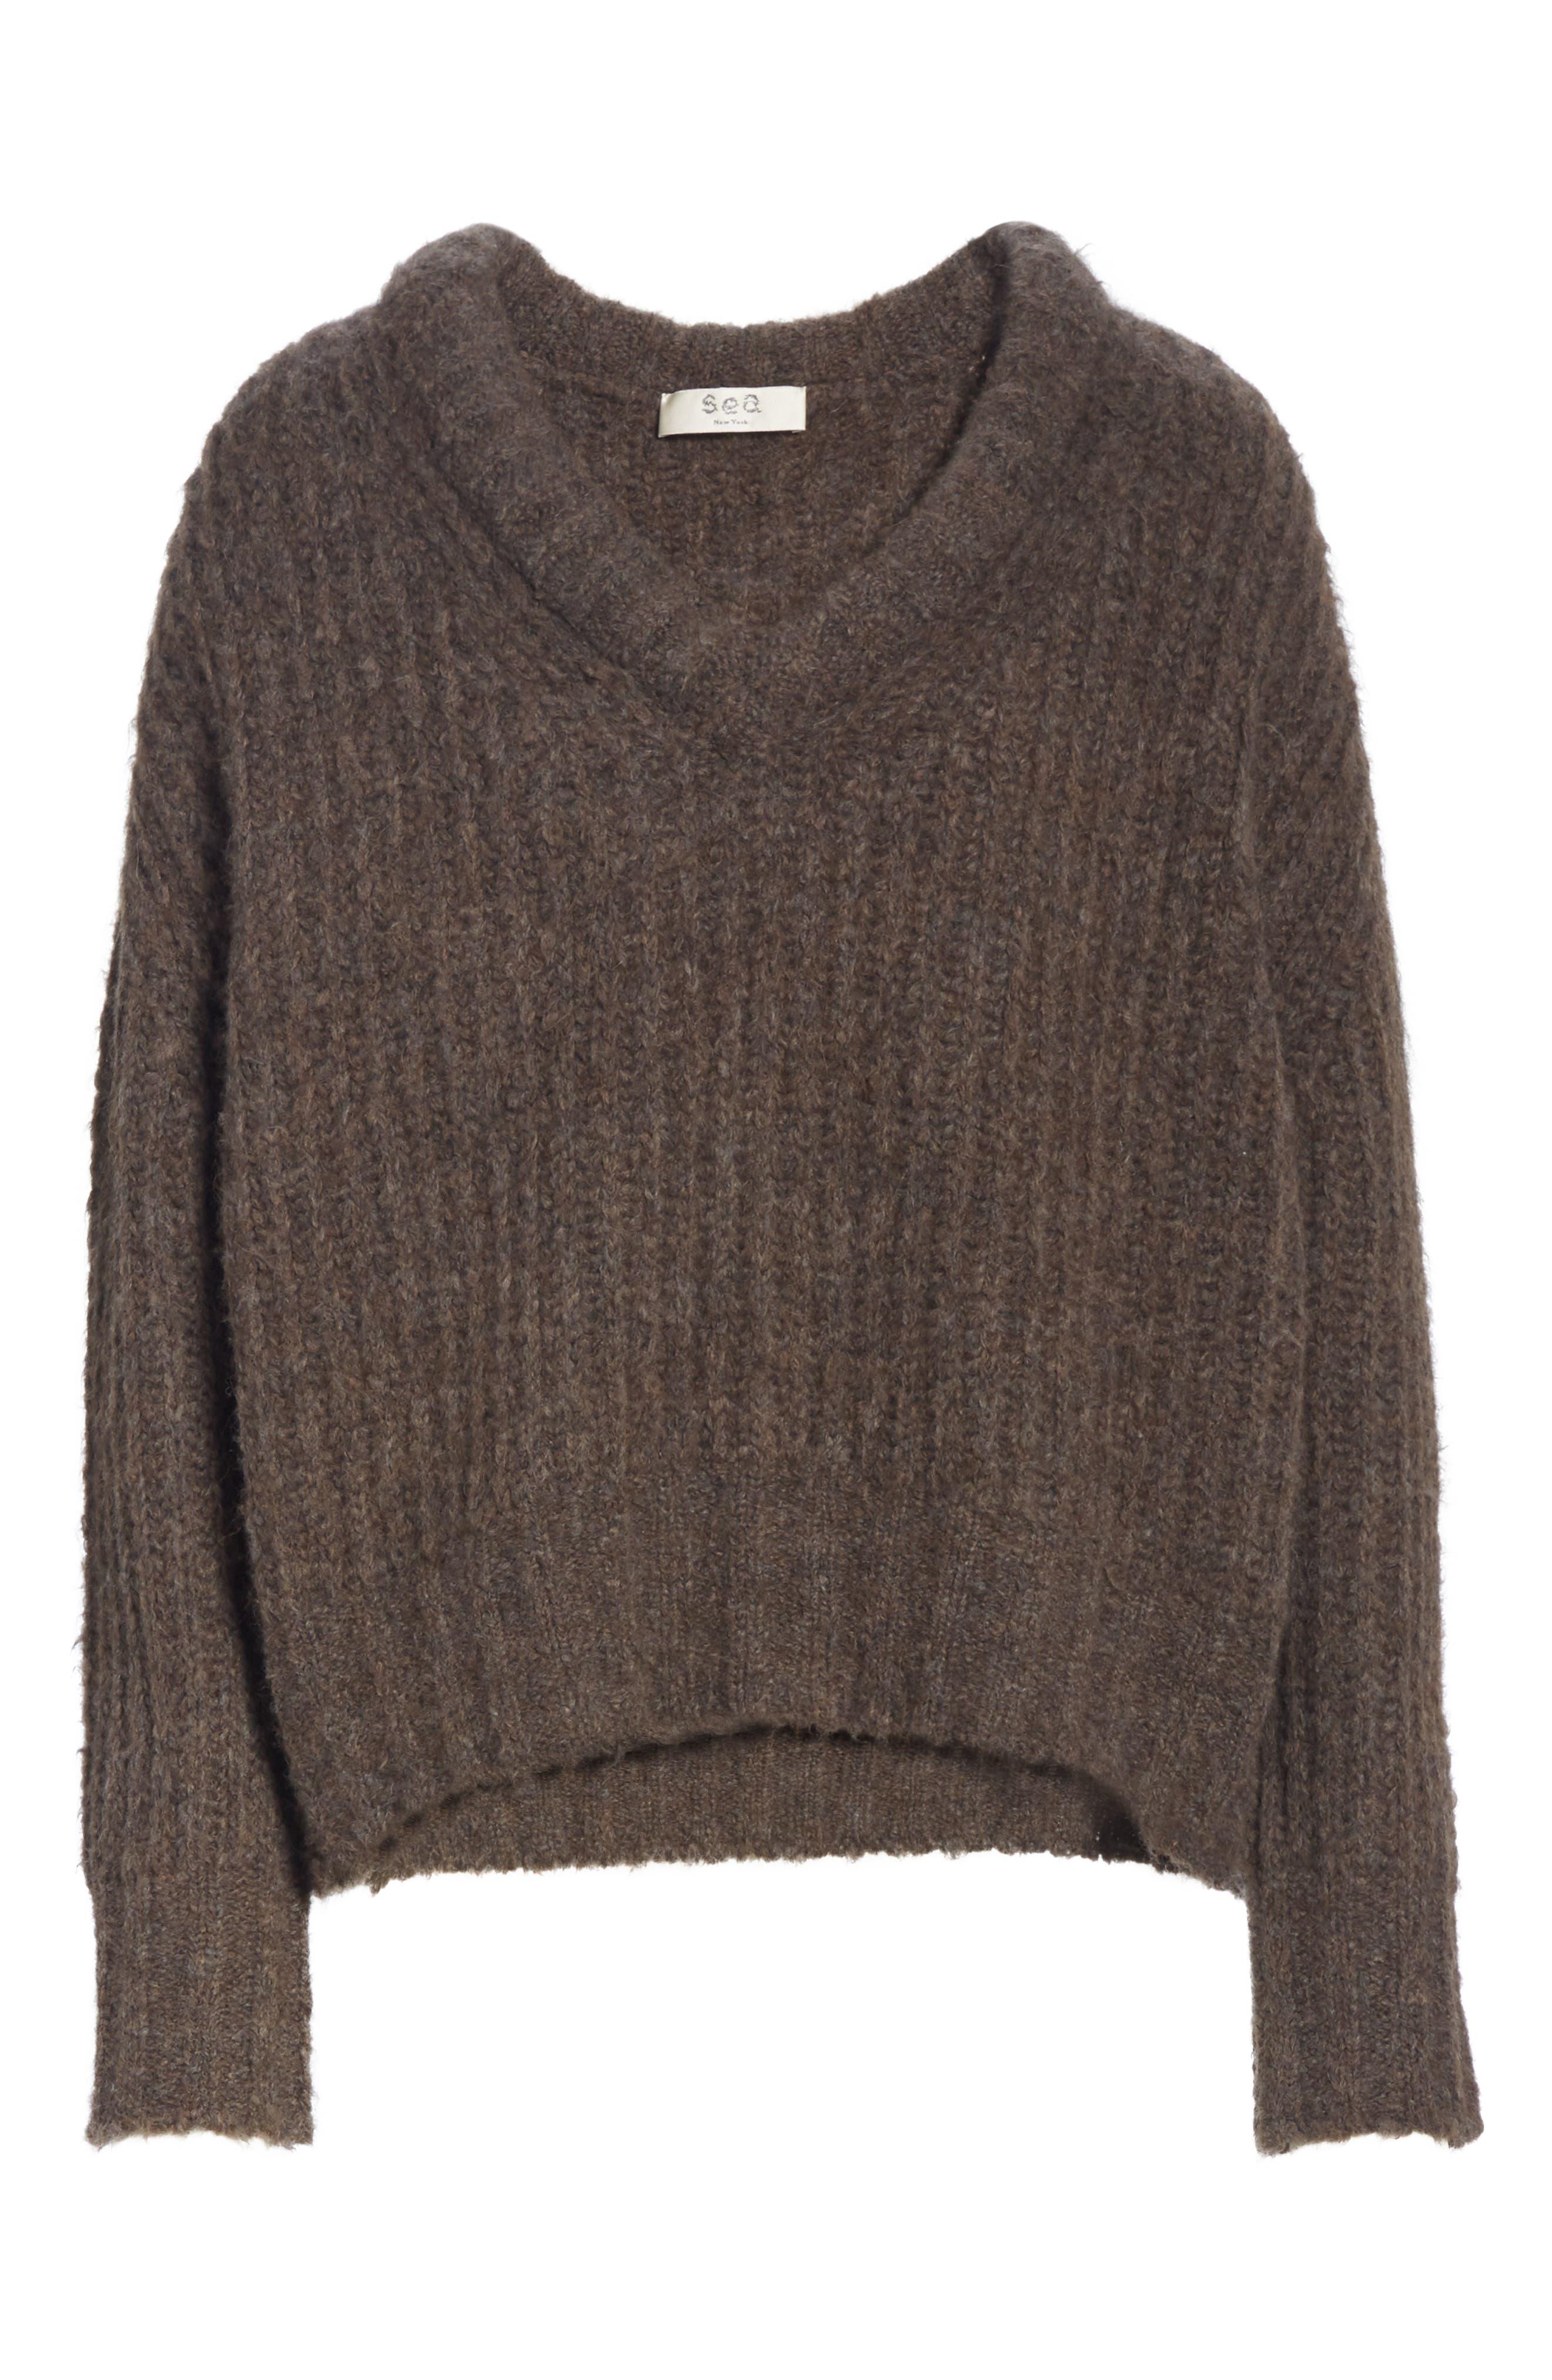 Fabiana Boxy Sweater,                             Alternate thumbnail 6, color,                             230